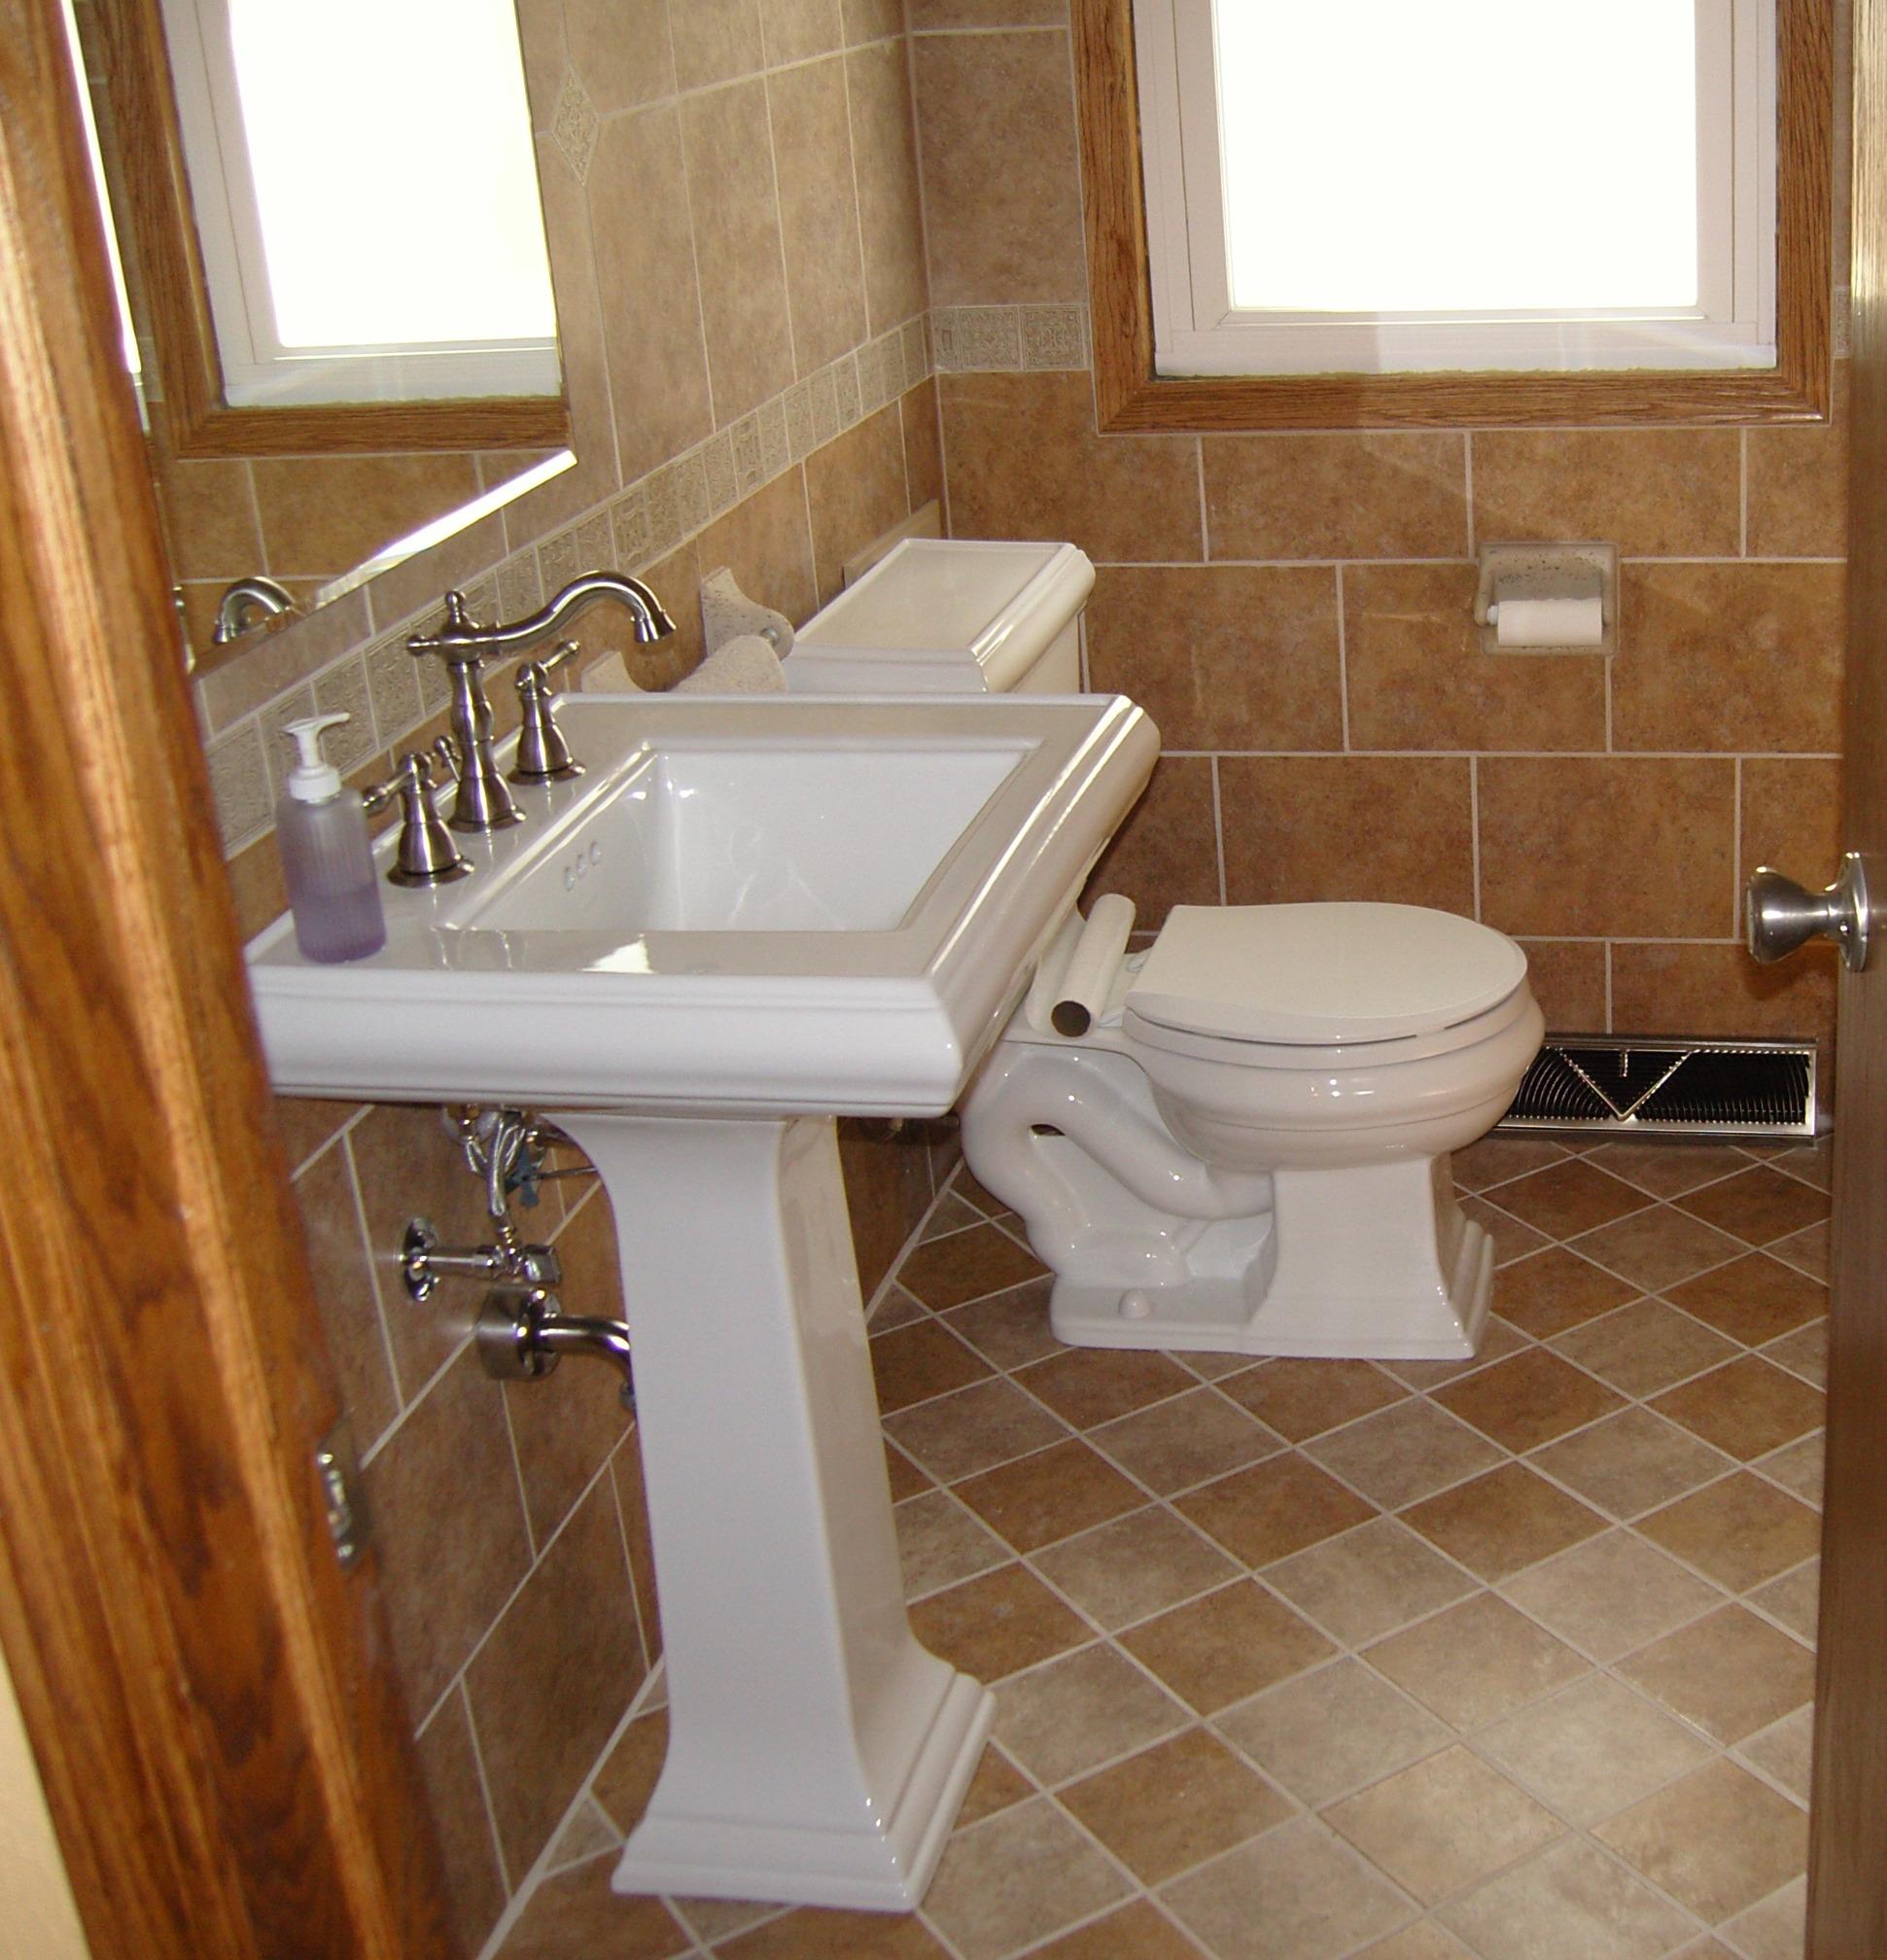 Tile-Floor-and-Wall-Beige-Install-Tile-Flooring.jpg